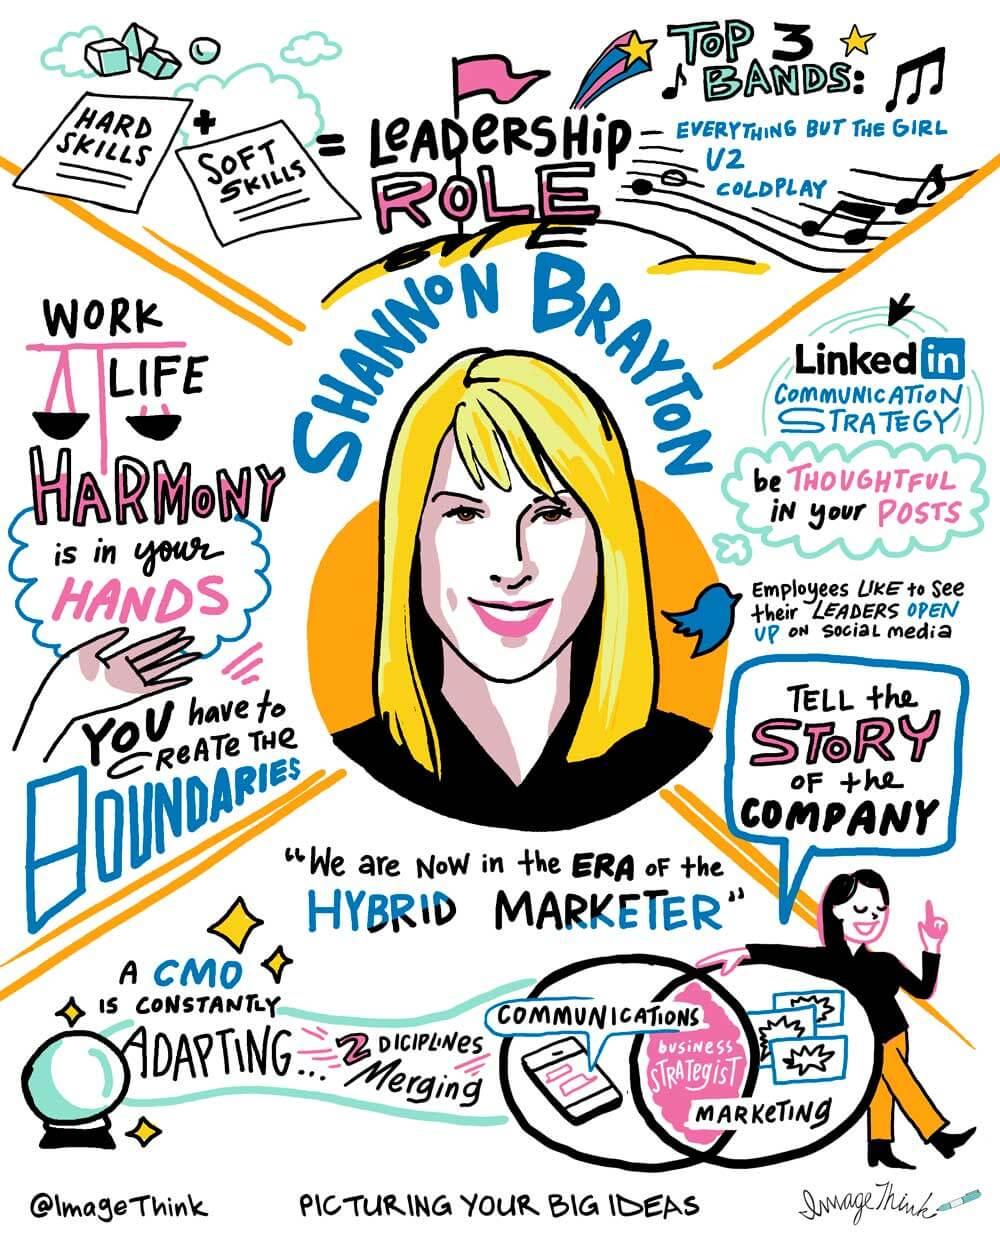 shannon brayton, linkedin, sophisticated marketer, imagethink, sketchnote